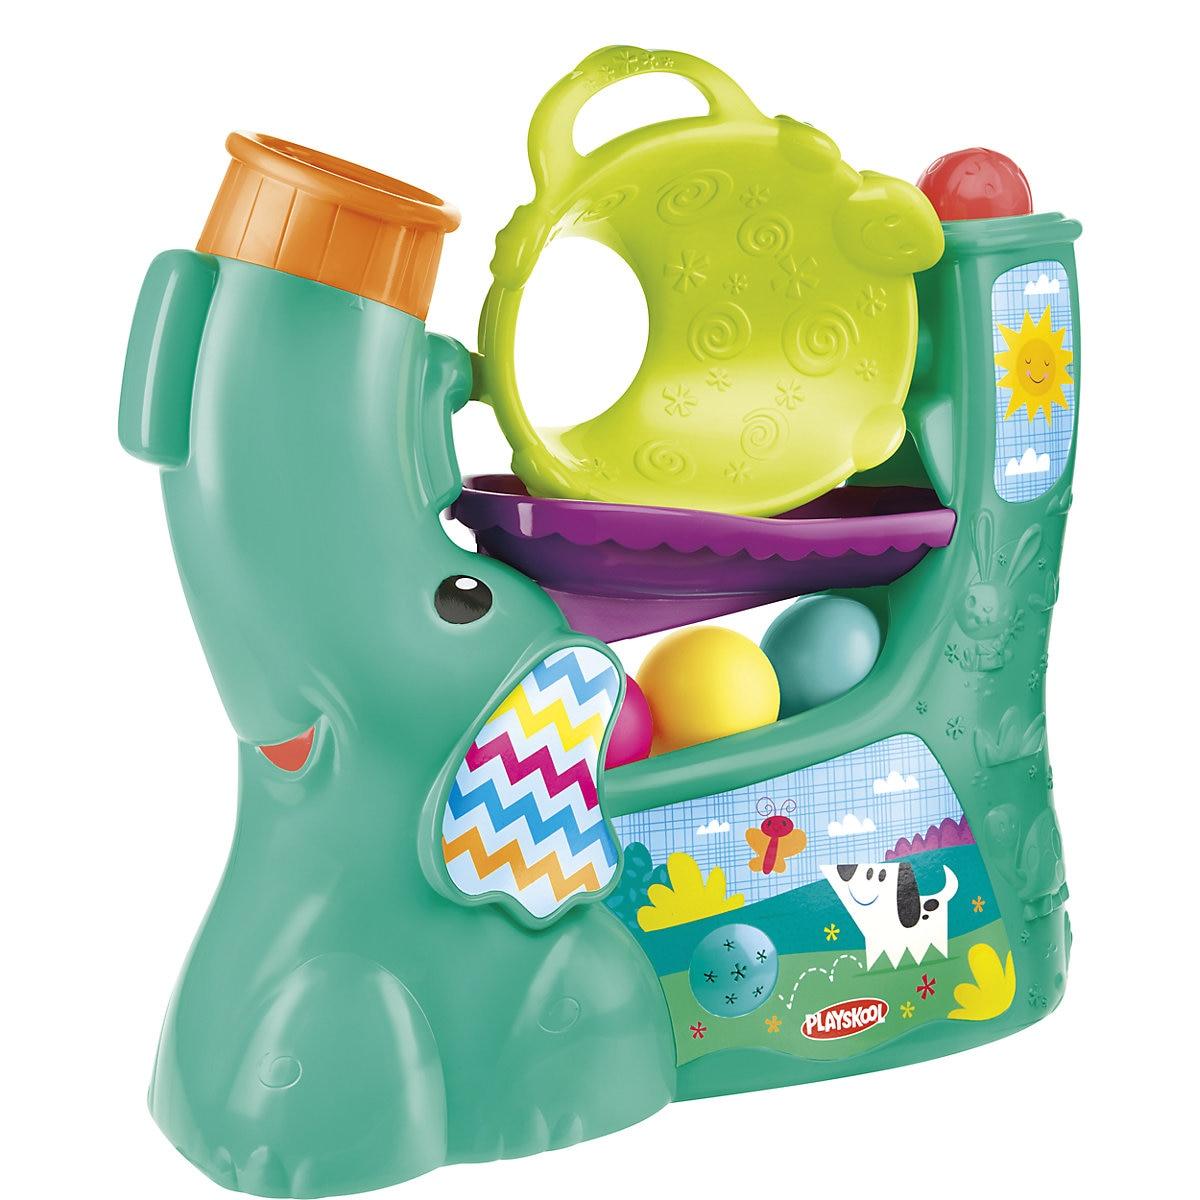 HASBRO Sorting, Nesting & Stacking Toys 4915060 educational games animals toy MTpromo - 2